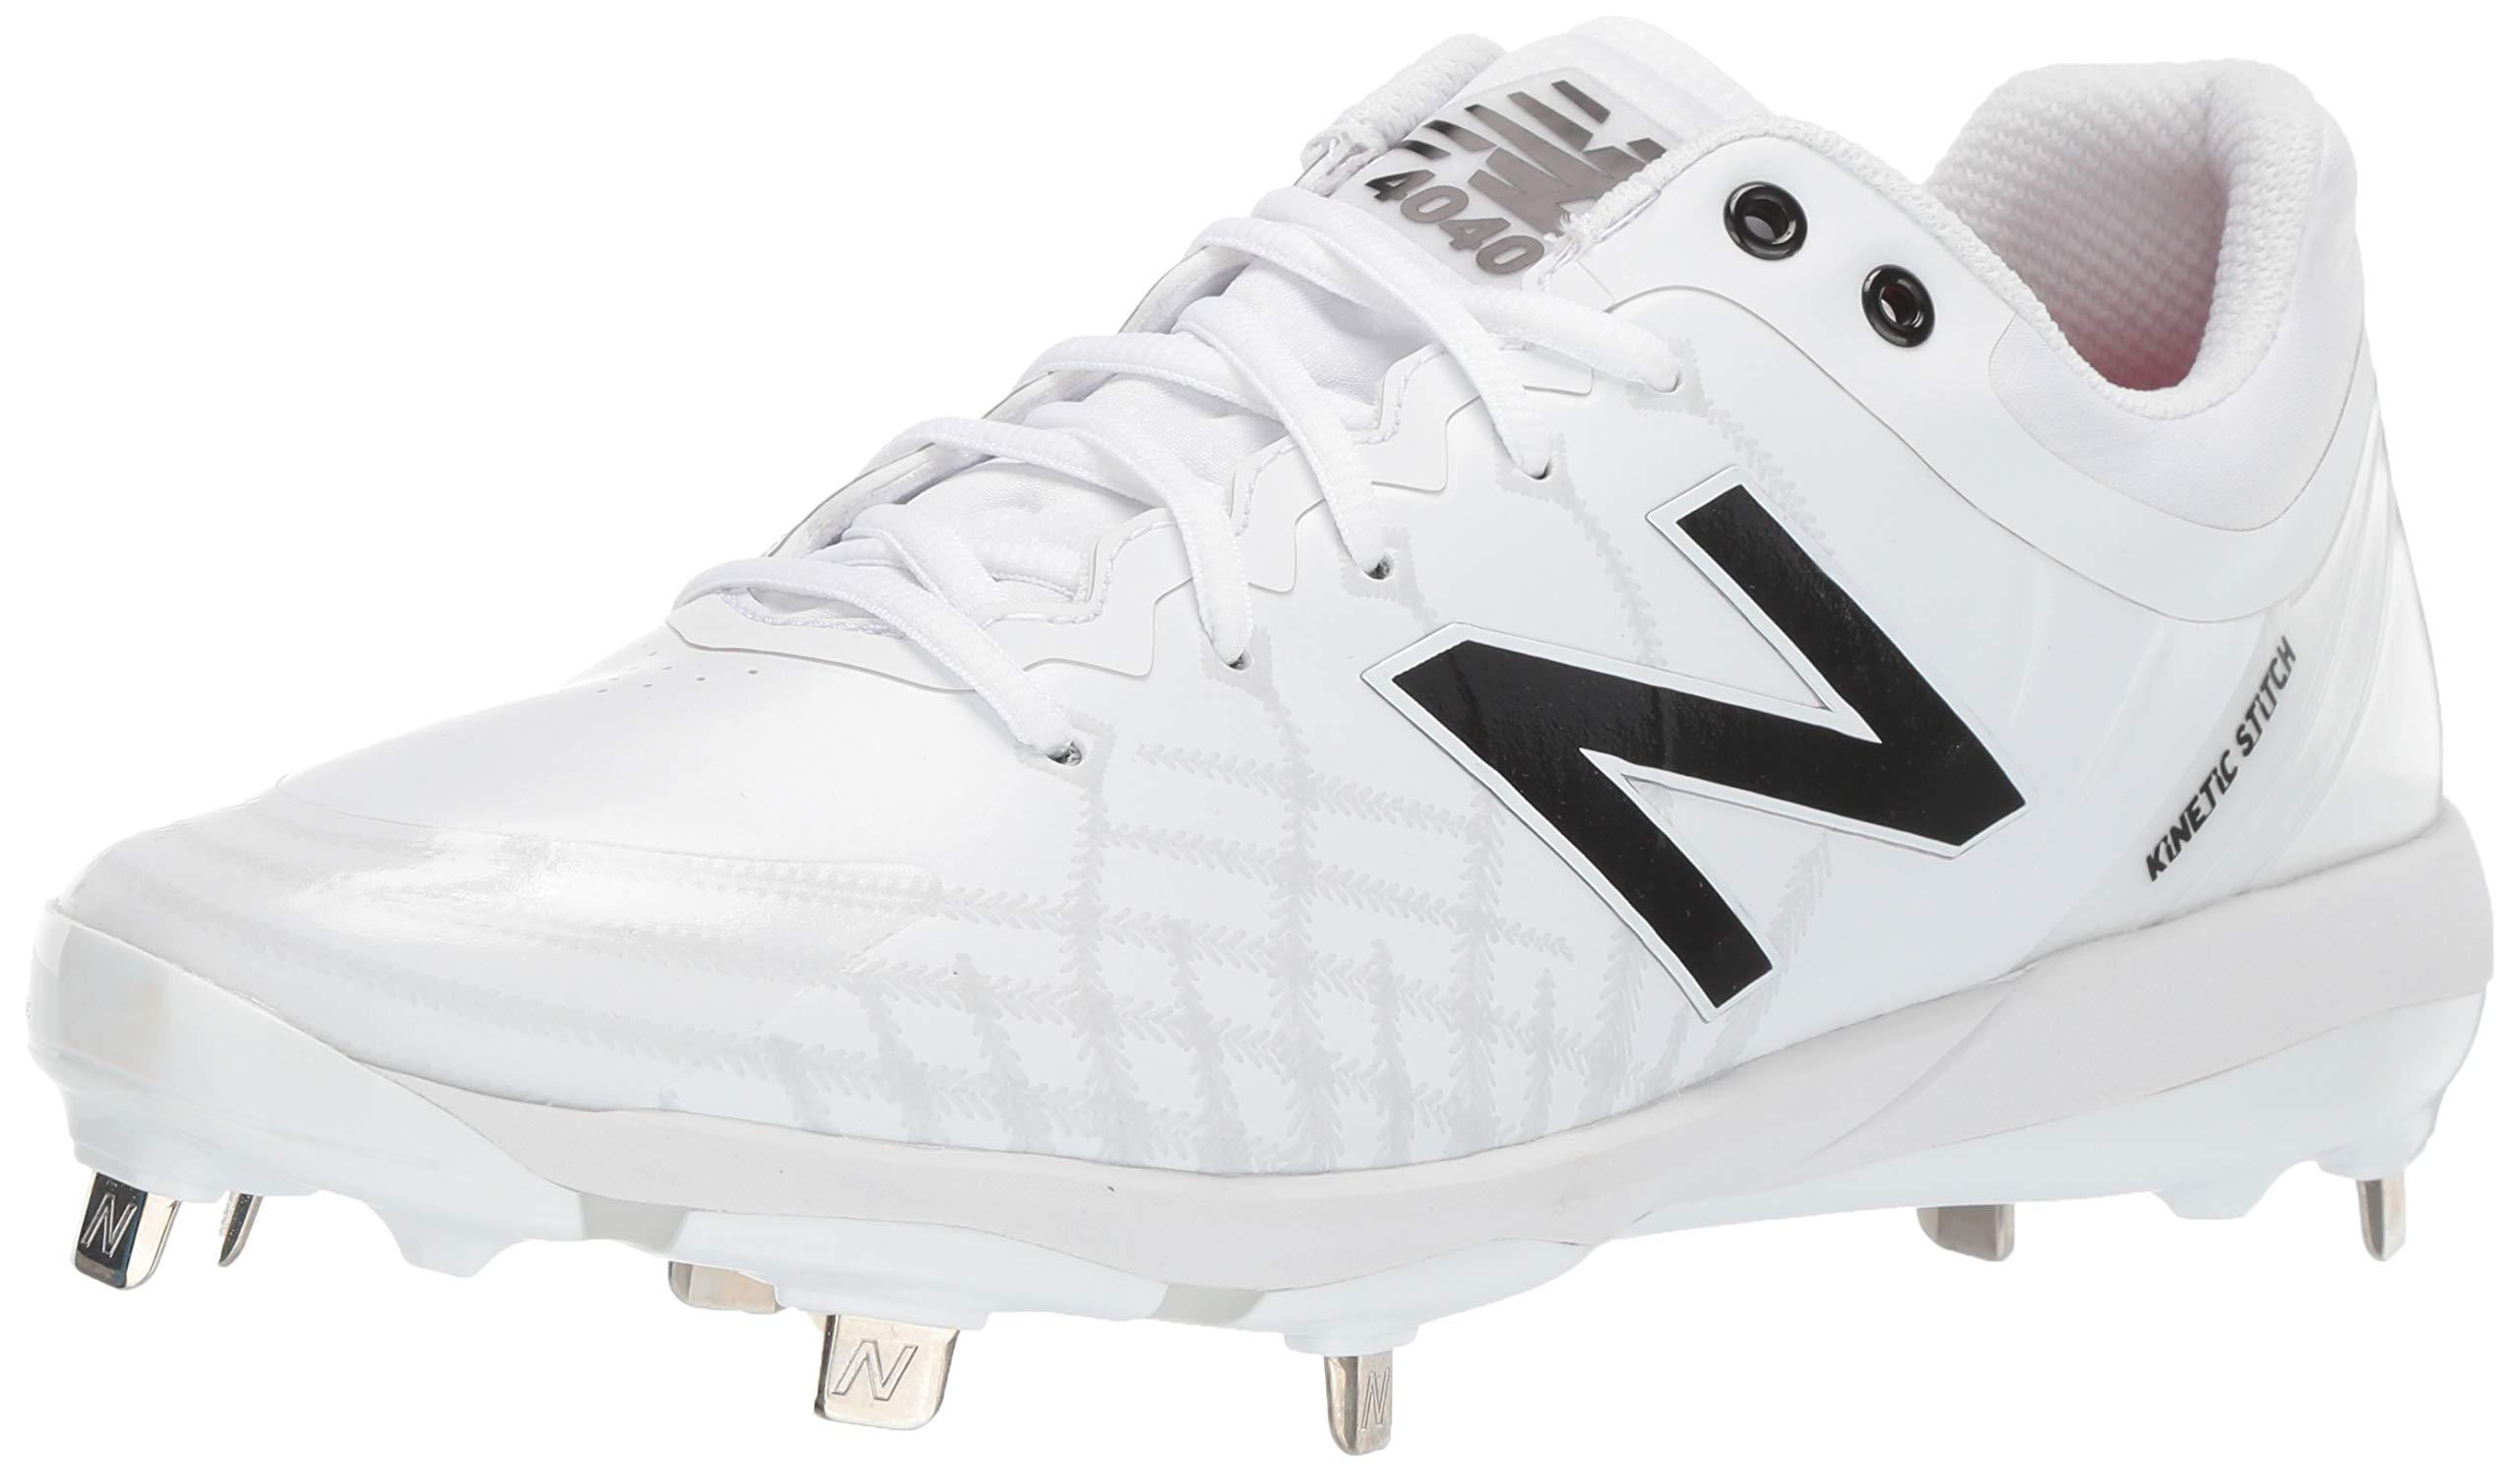 New Balance Men's 4040v5 Metal Low-Cut Baseball Cleat, White/White, 9 M US by New Balance